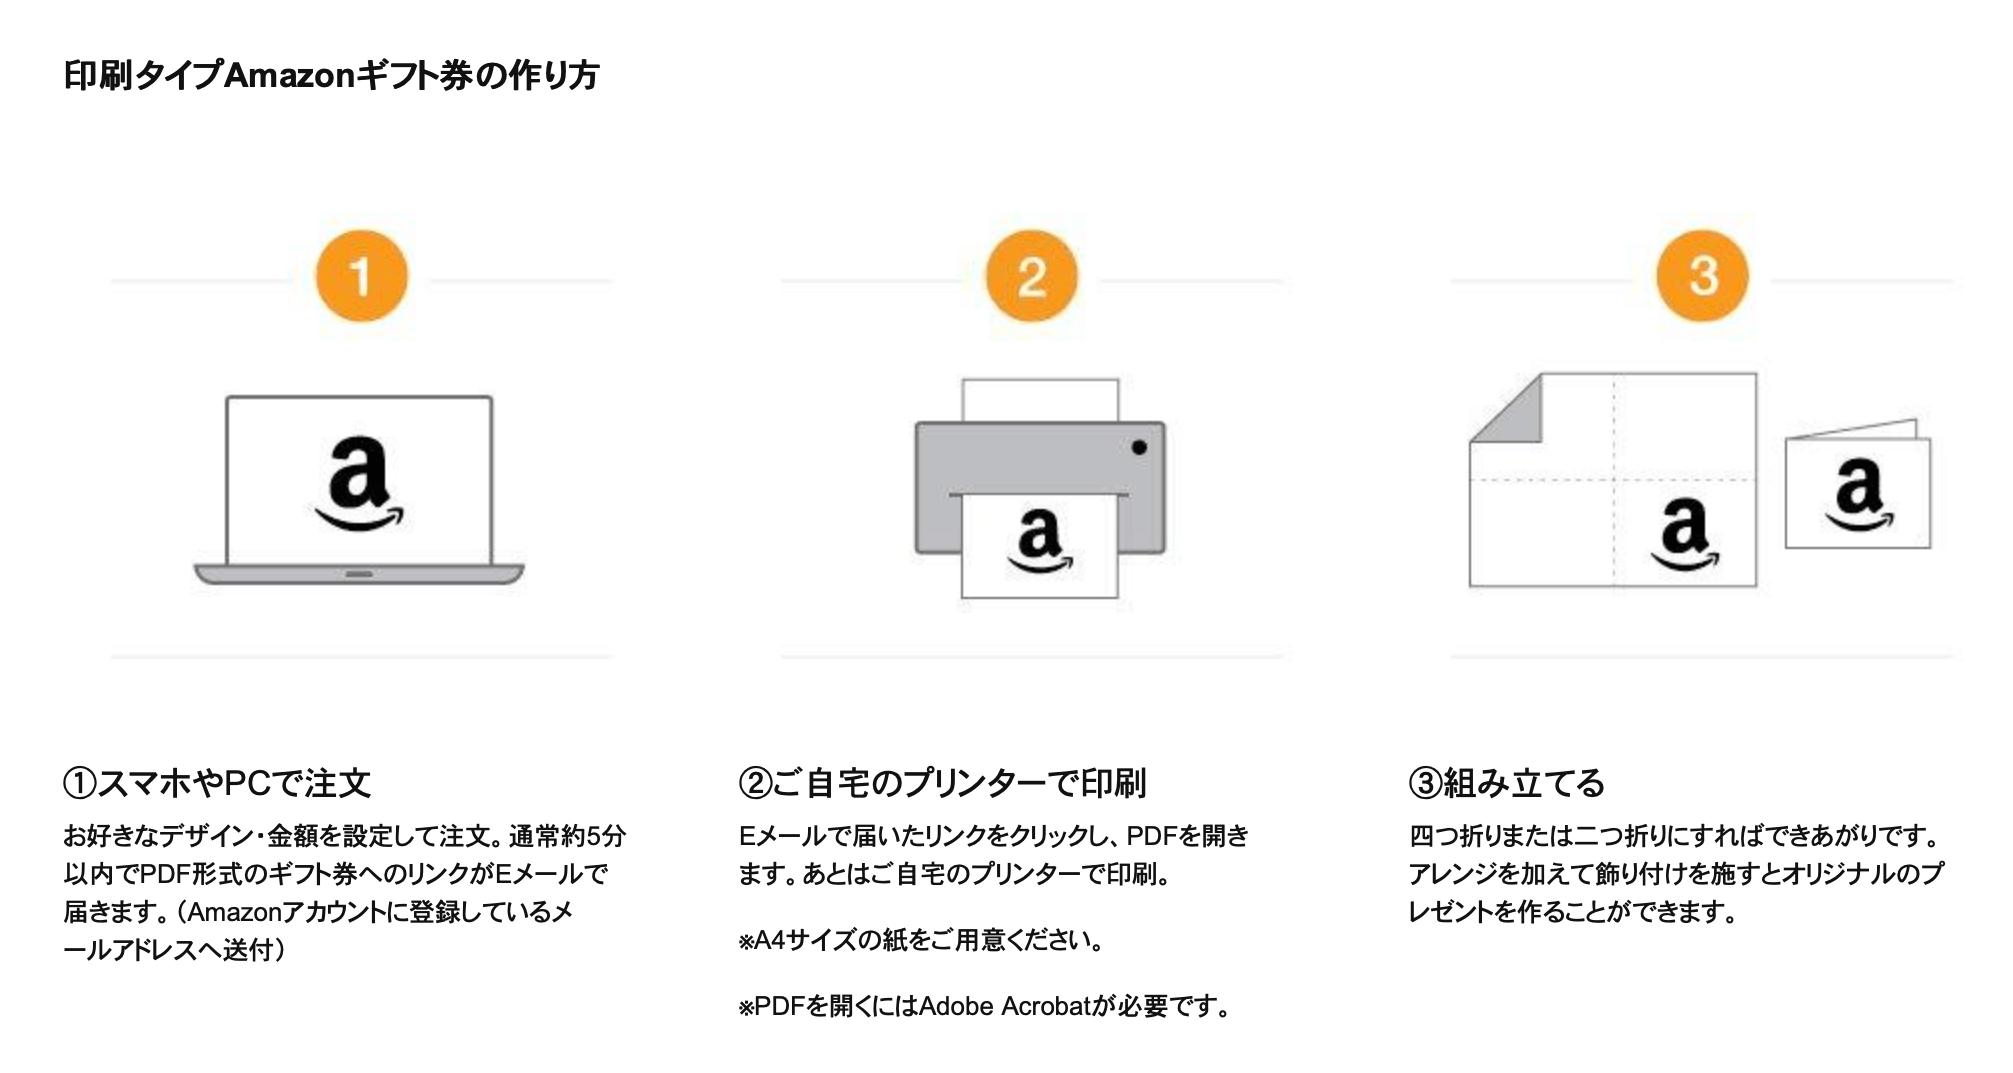 Amazonギフト印刷タイプ作り方